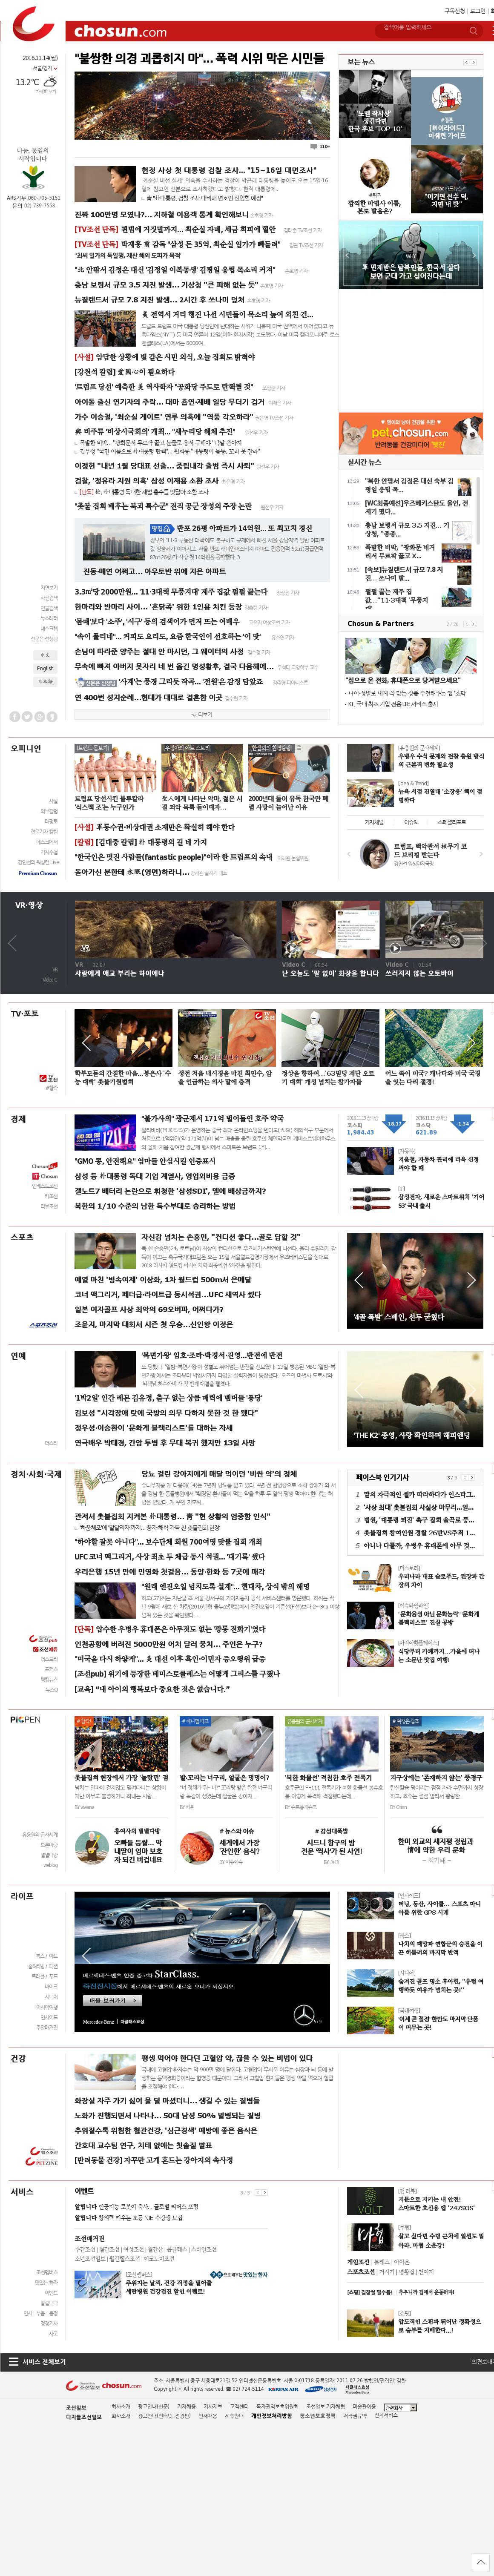 chosun.com at Sunday Nov. 13, 2016, 3:02 p.m. UTC